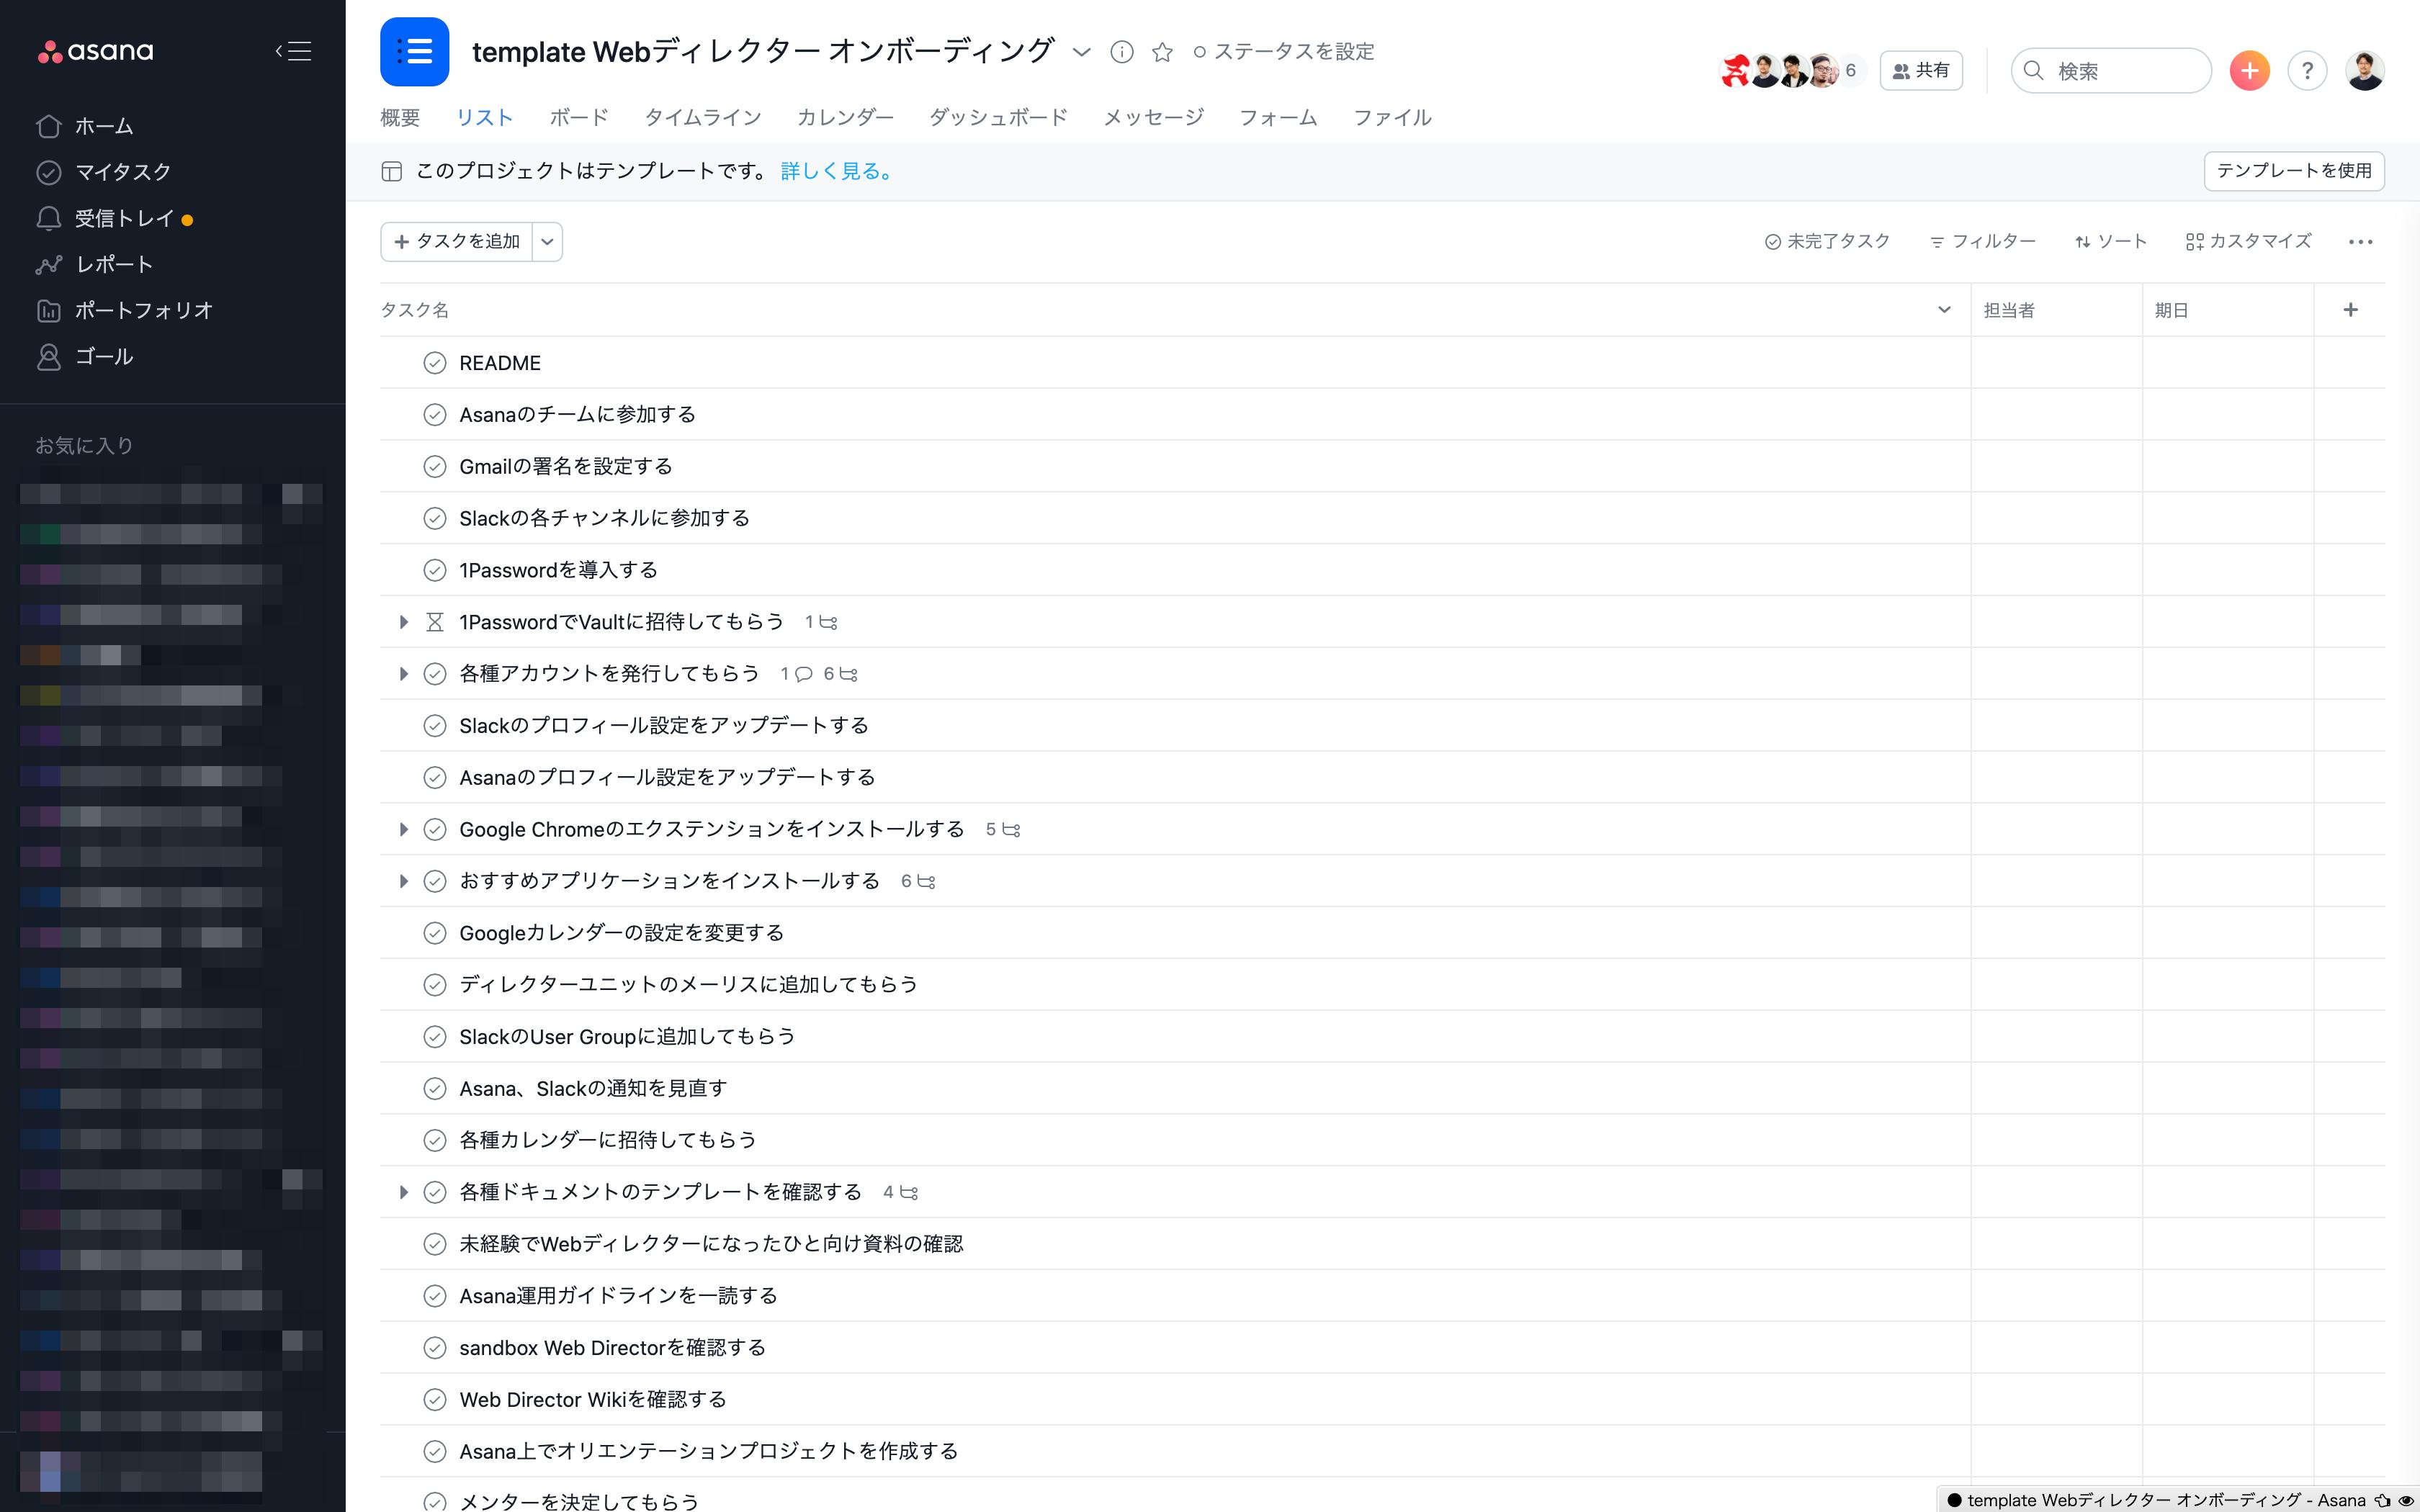 asanaガイドライン・教育マニュアル